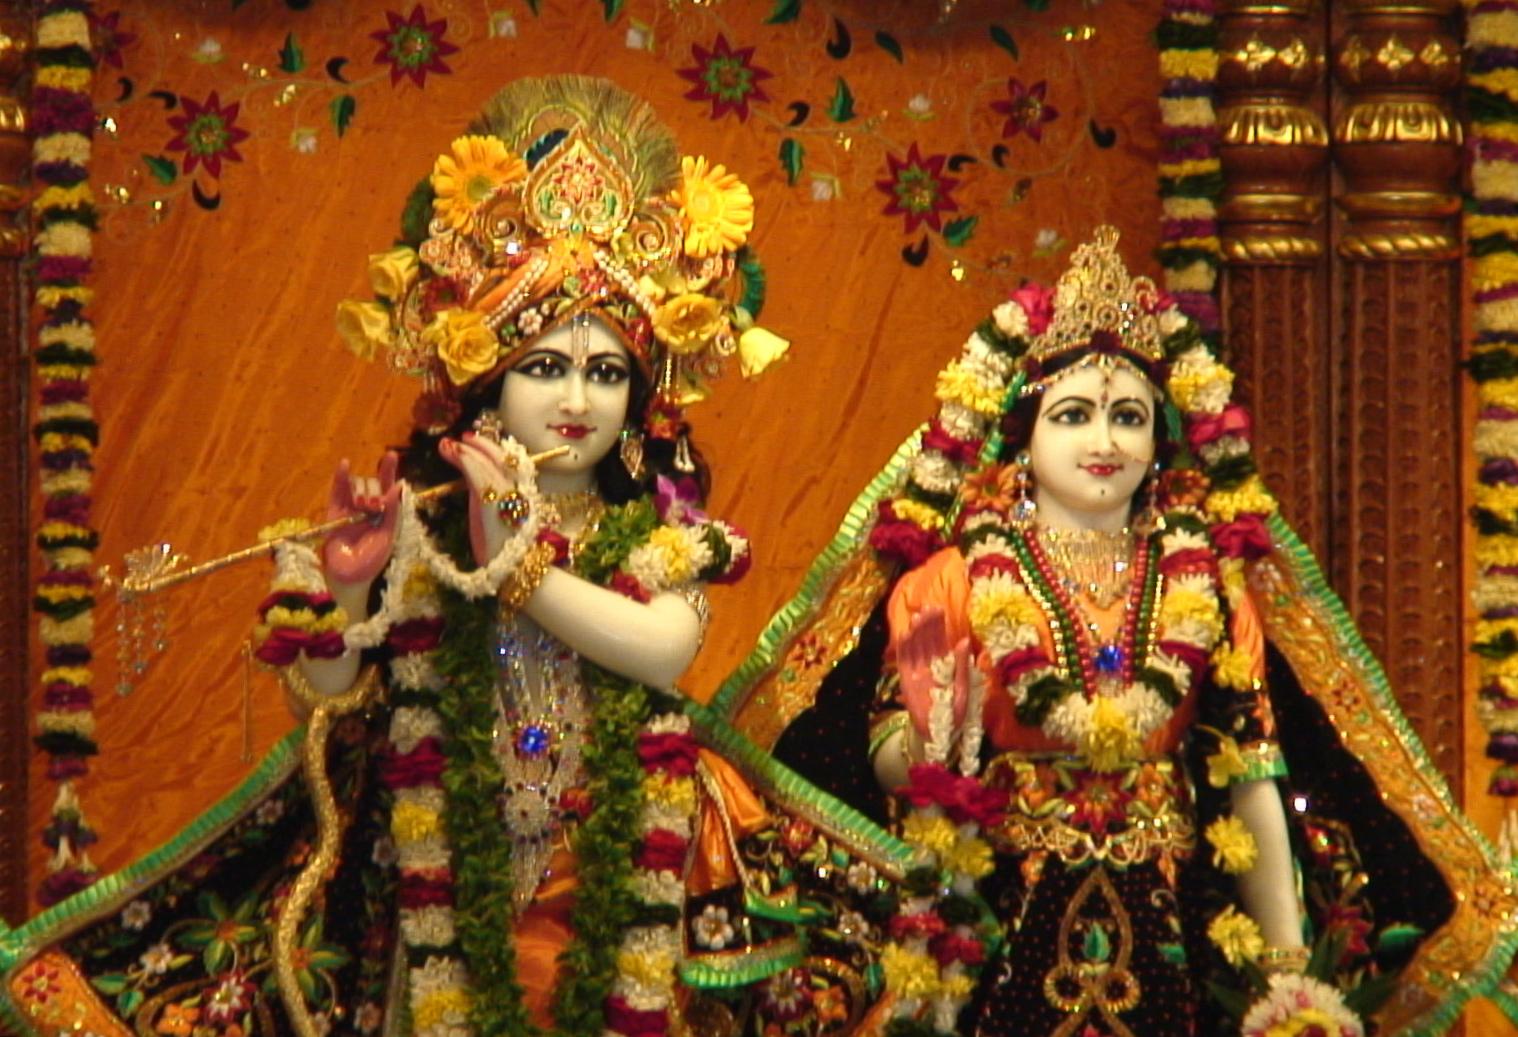 http://1.bp.blogspot.com/_NSGngat267s/TQcGAMTpJ4I/AAAAAAAAAD0/p_Rqnri7O1g/s1600/Radha_Krishna_ISKCON_Tirupati.JPG